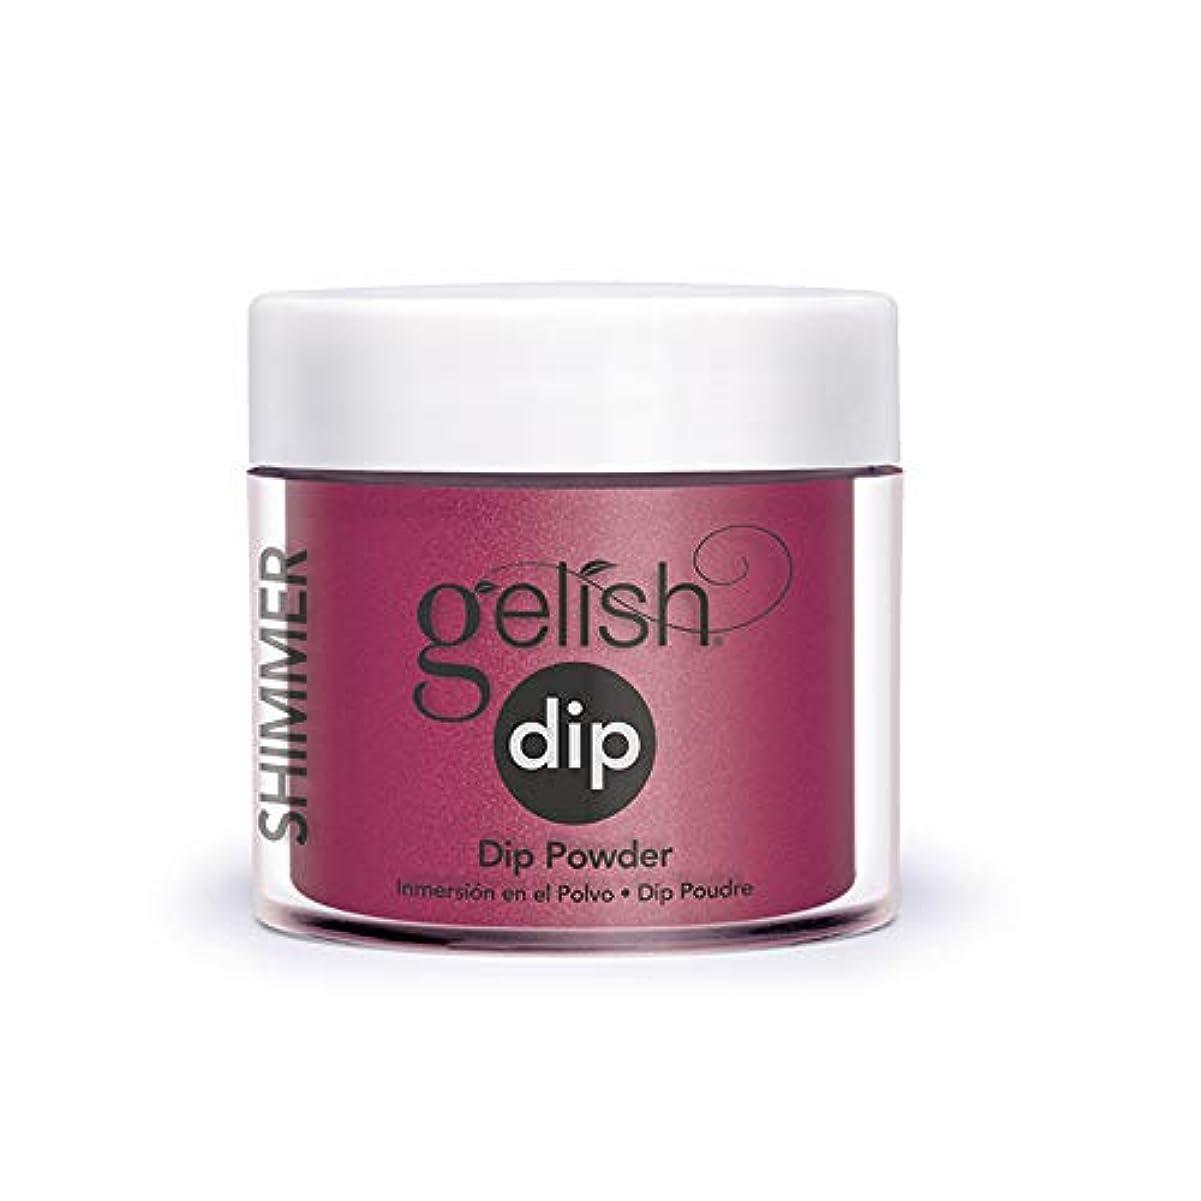 Harmony Gelish - Acrylic Dip Powder - What's Your Pointsettia? - 23g / 0.8oz